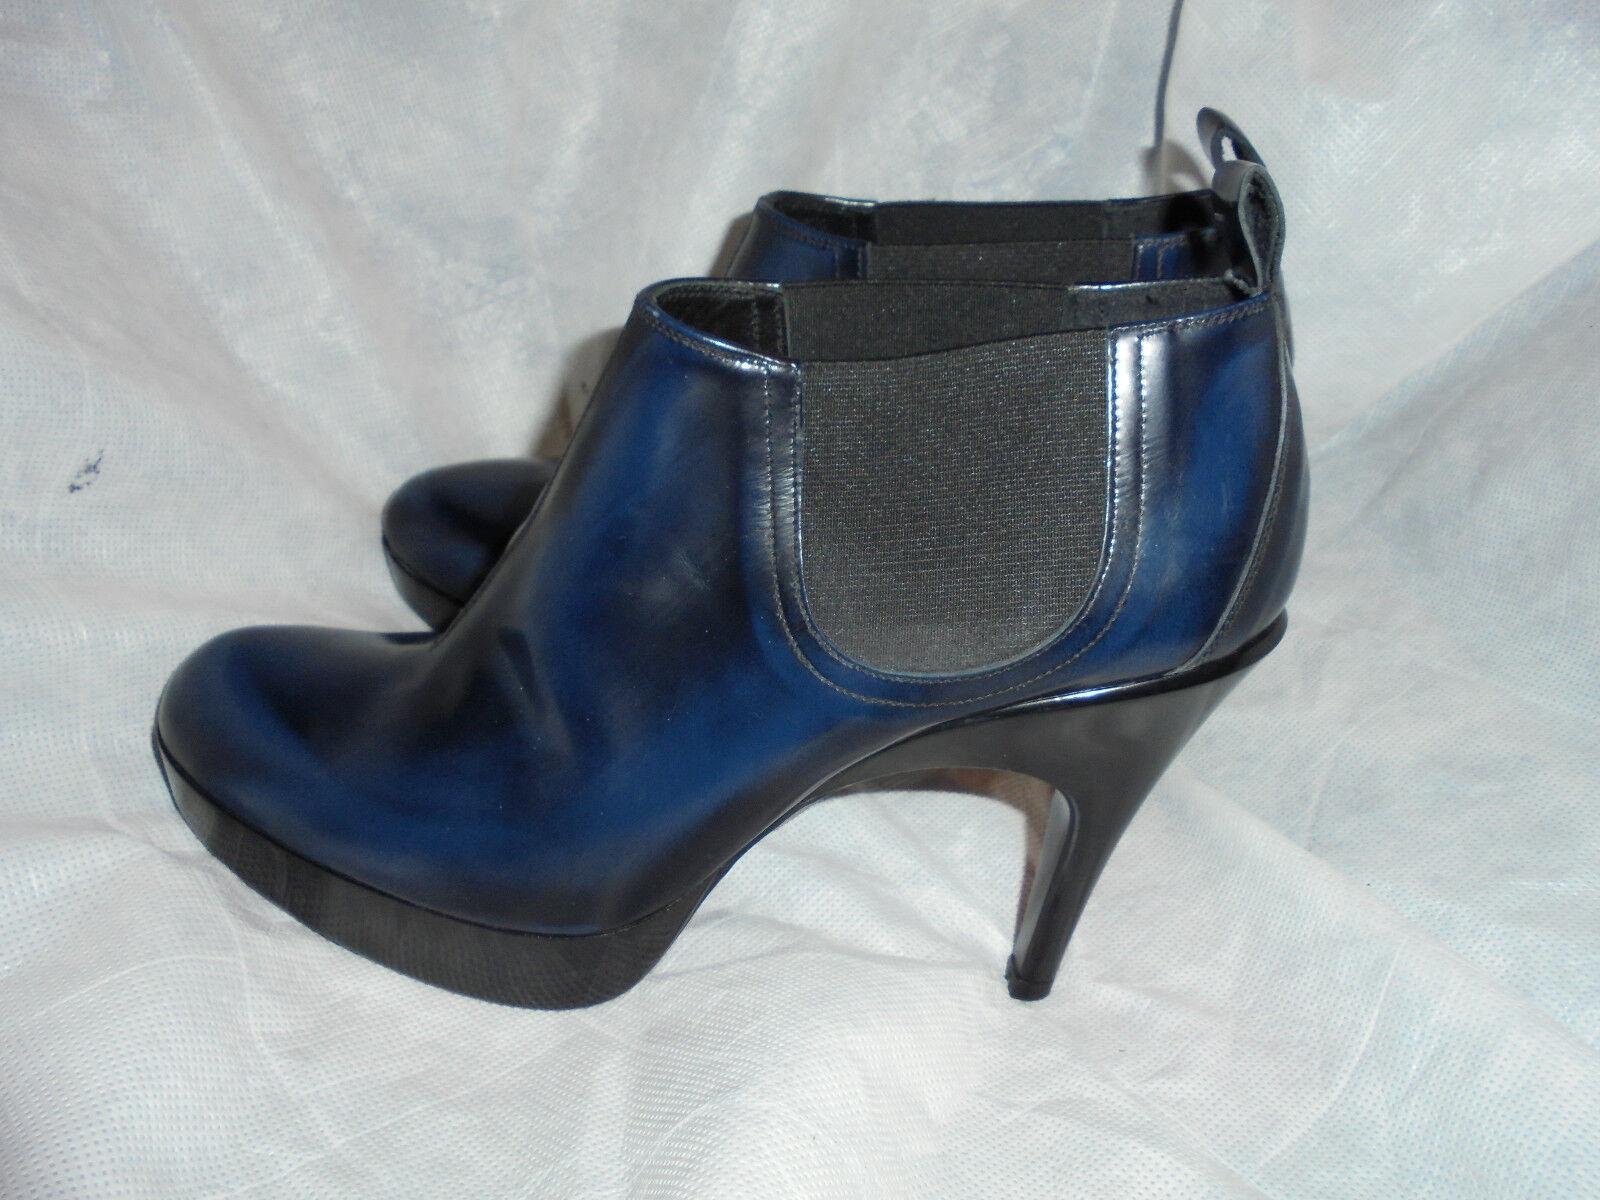 PEDRO GARCIA WOMEN'S Blau LEATHER  PULL ON ELASTIC BOOTS Größe UK 6.5 EU 39.5 VGC